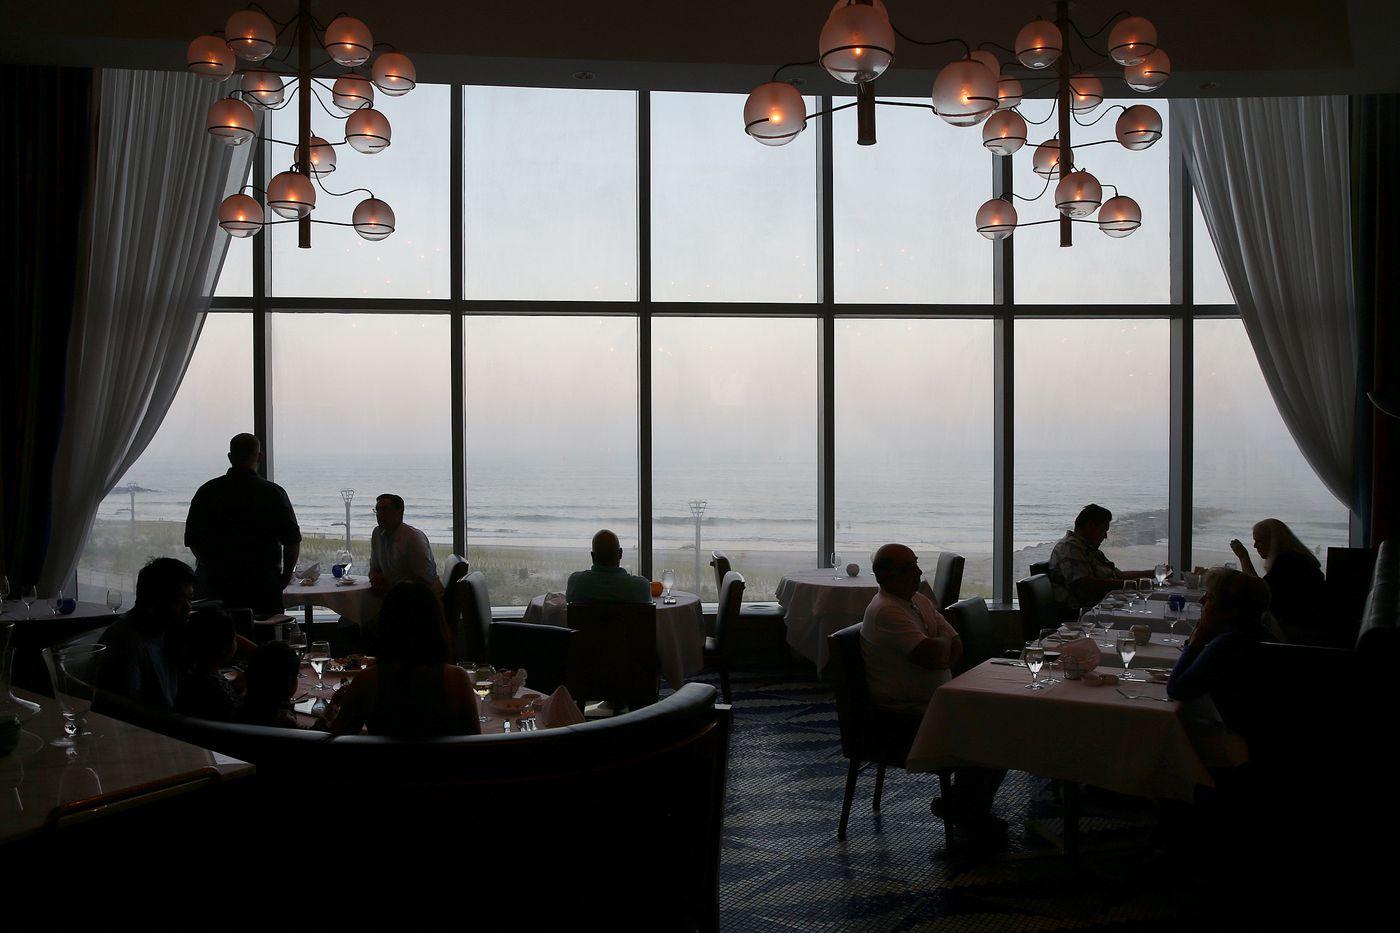 Atlantic City Restaurants New Casinos Diverse Independent Spots